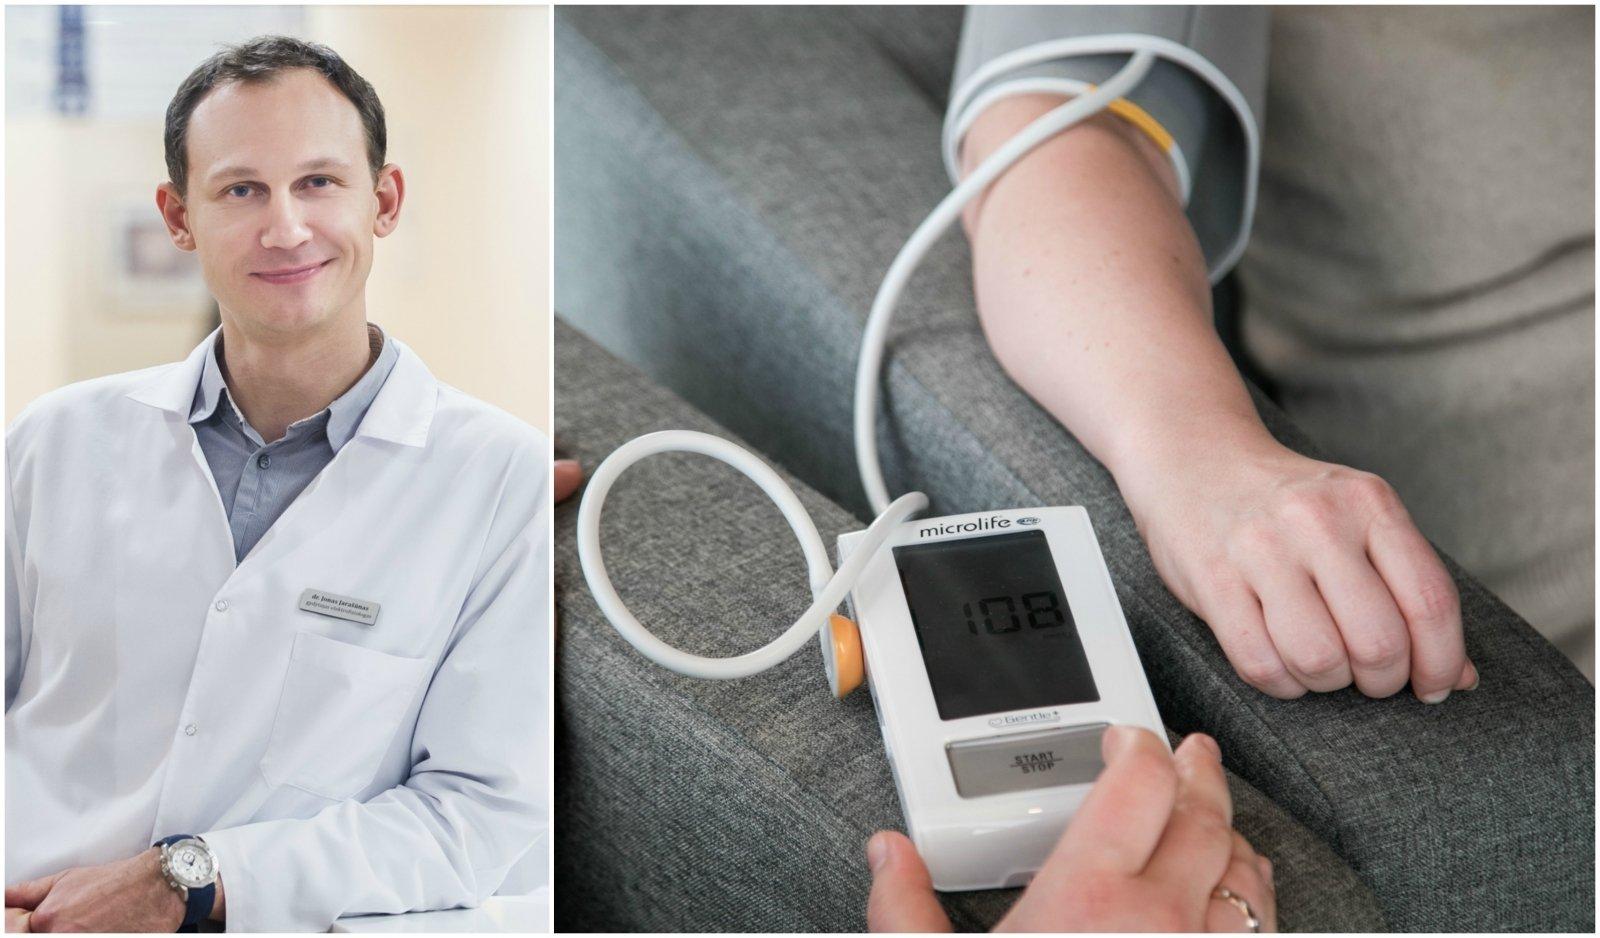 Ar hipertenzija gydoma jaunystėje)